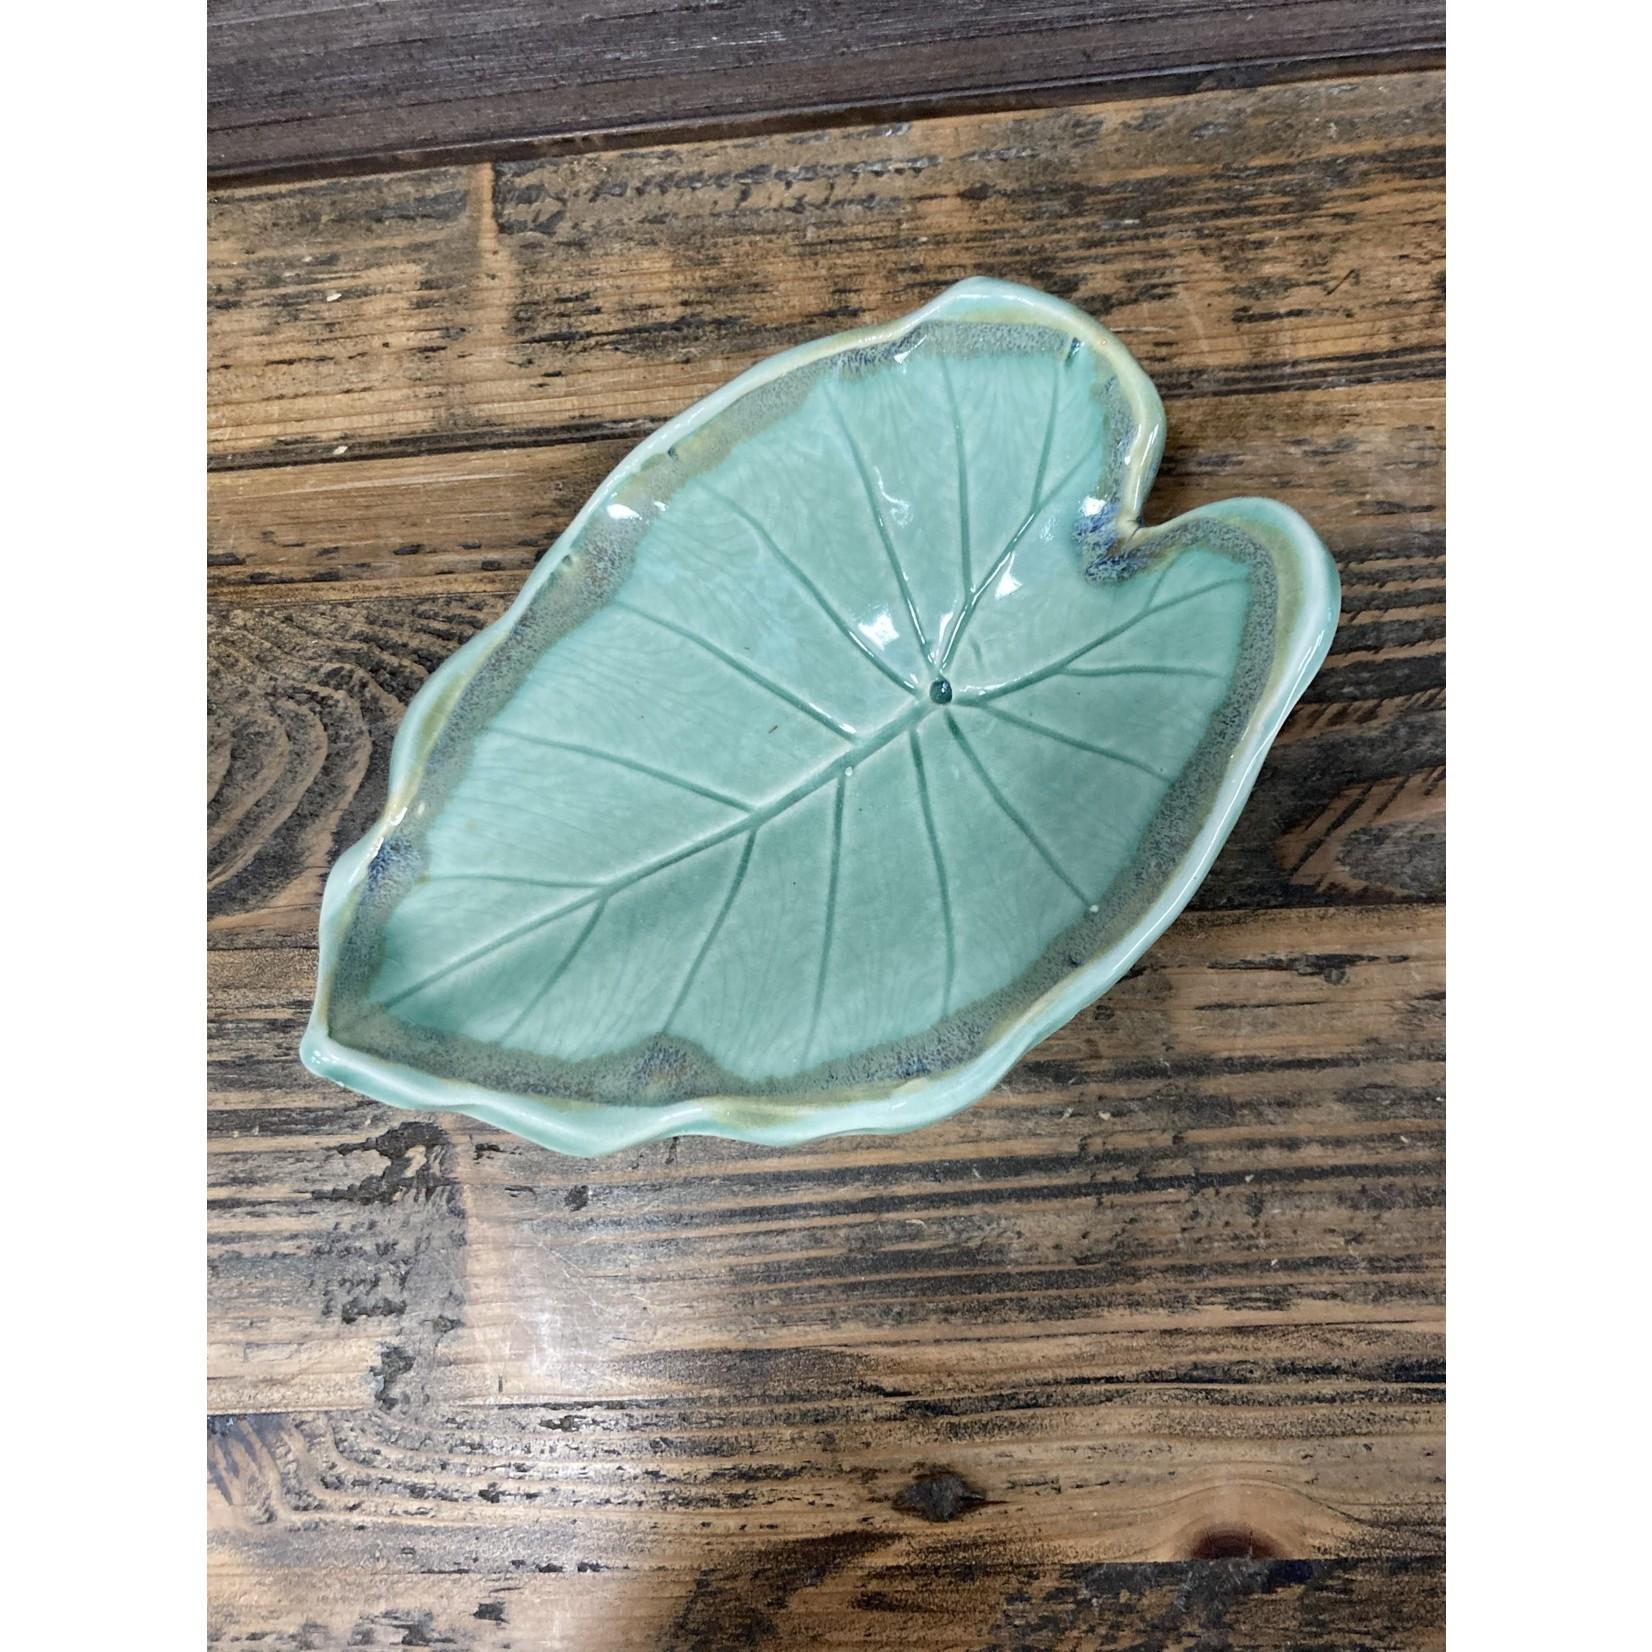 Karen McKee Karen McKee pottery # 4 elephant ear dish